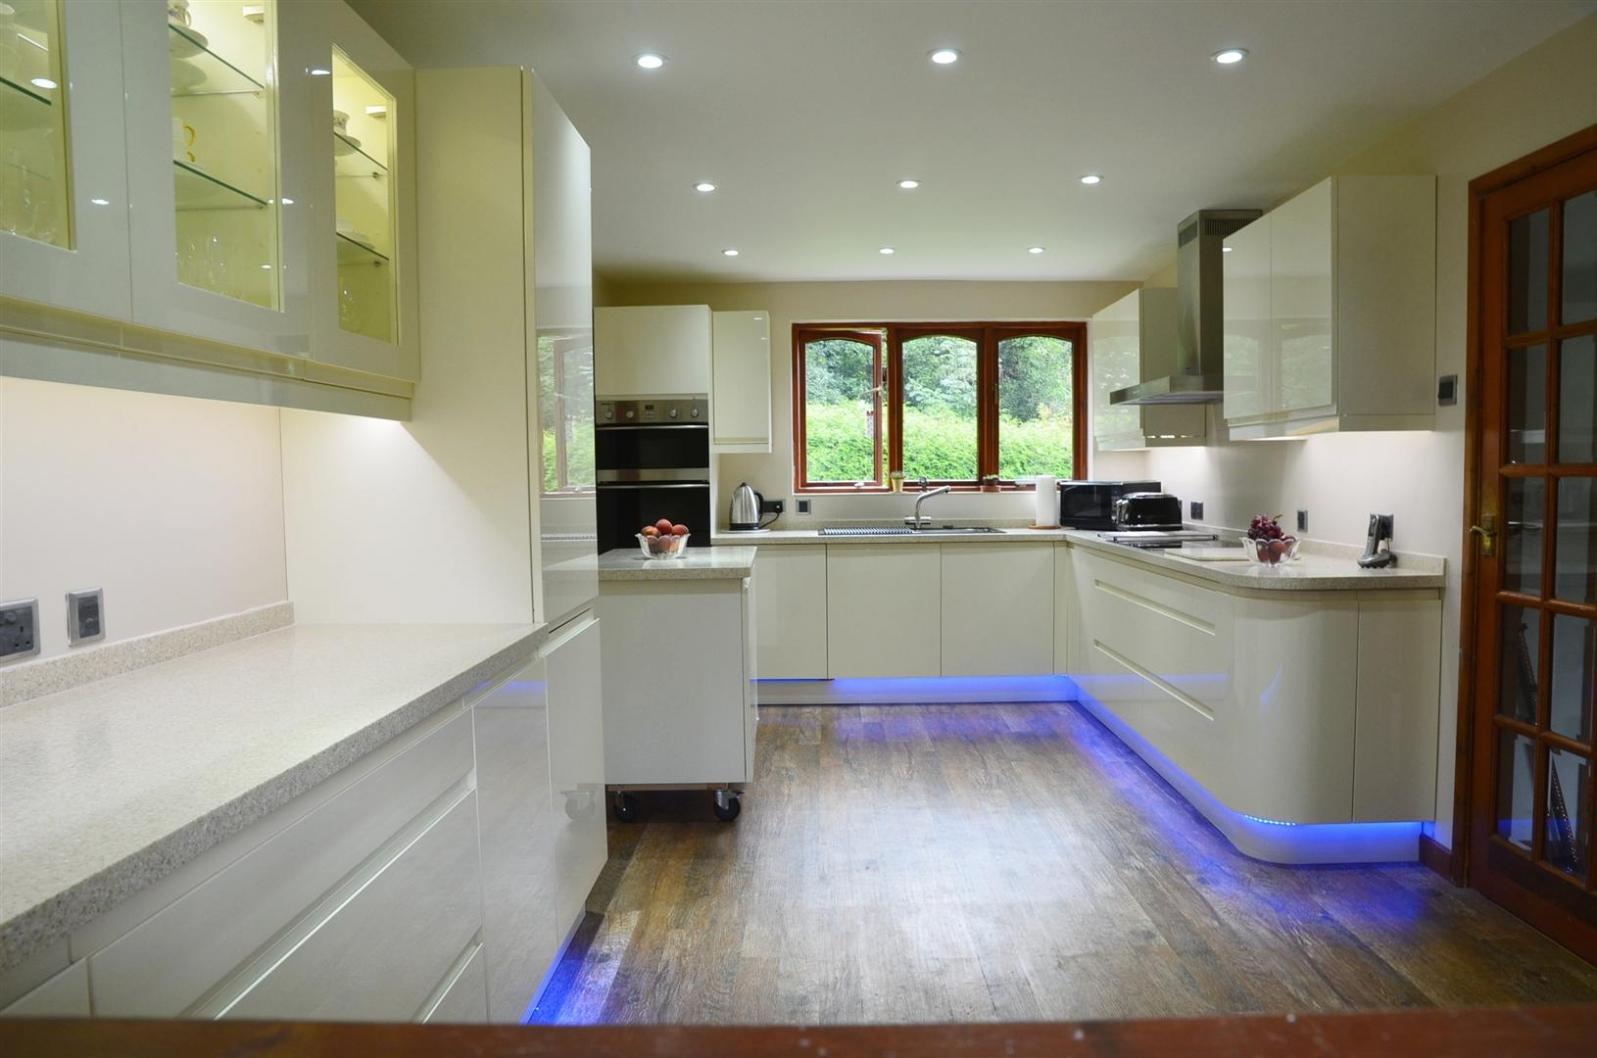 Homebase Kitchen Plinth Lights